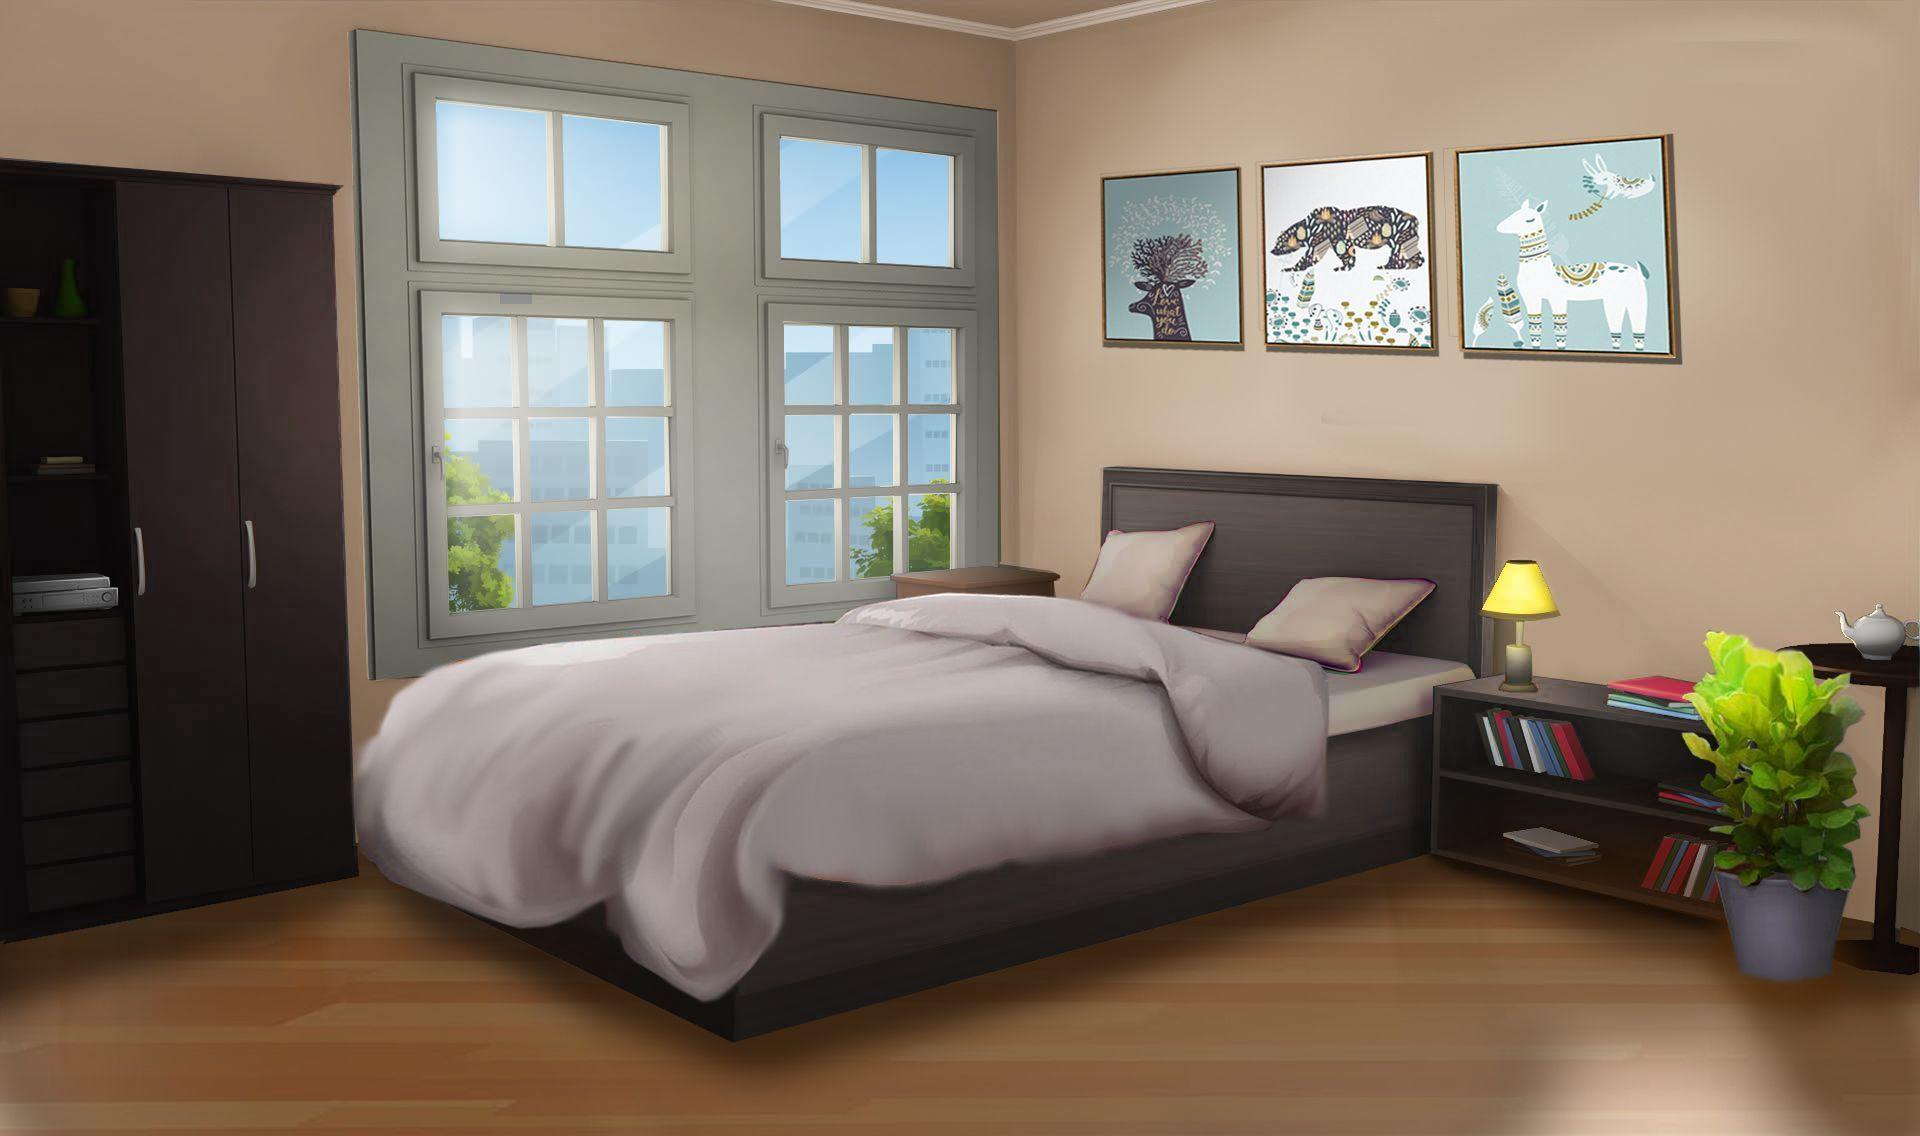 Anime Scenery Wallpaper Cute Anime Bedroom Background Anime Wallpaper Hd